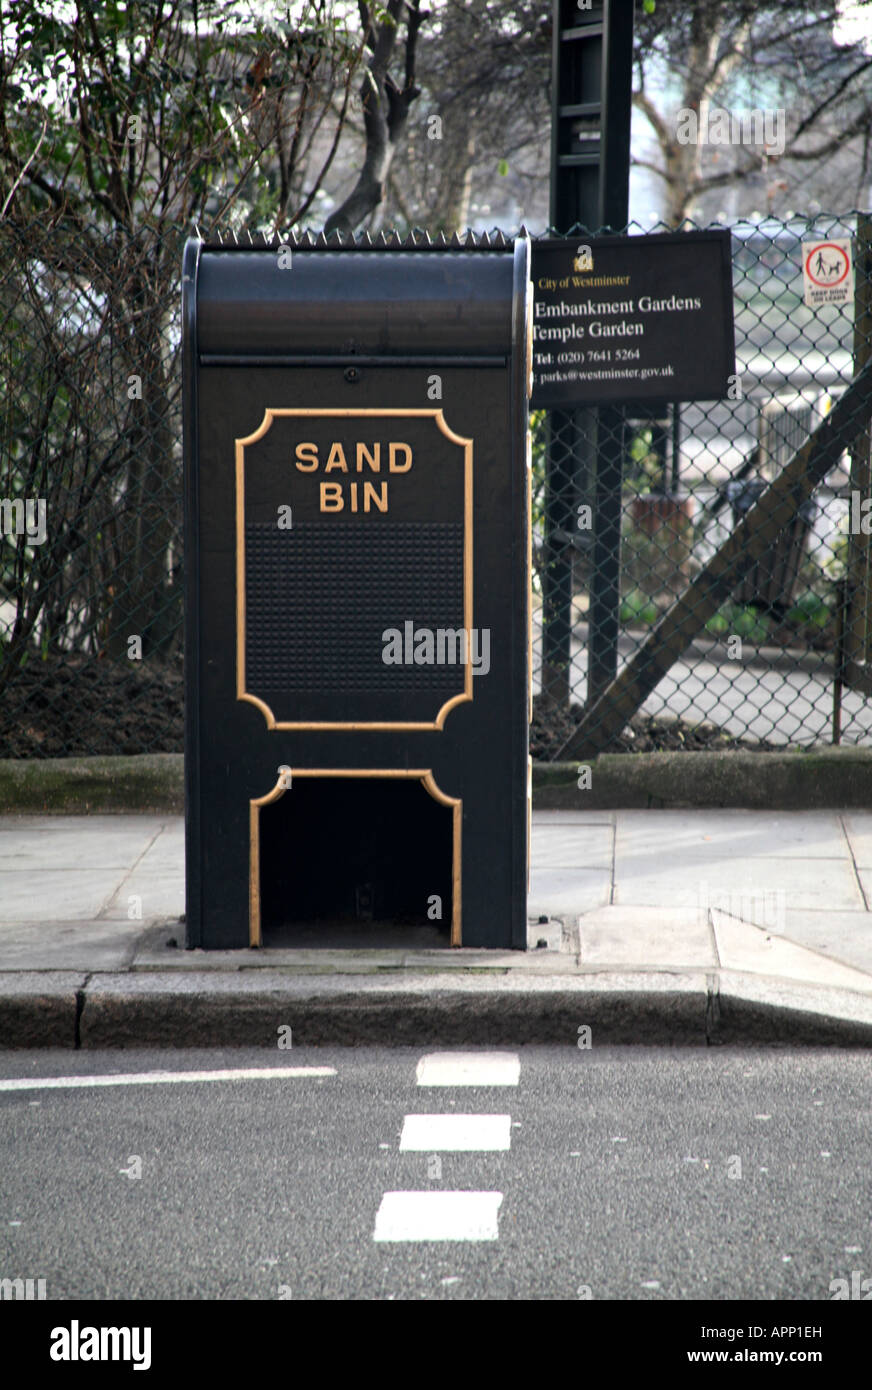 London Embankment sand bin - Stock Image